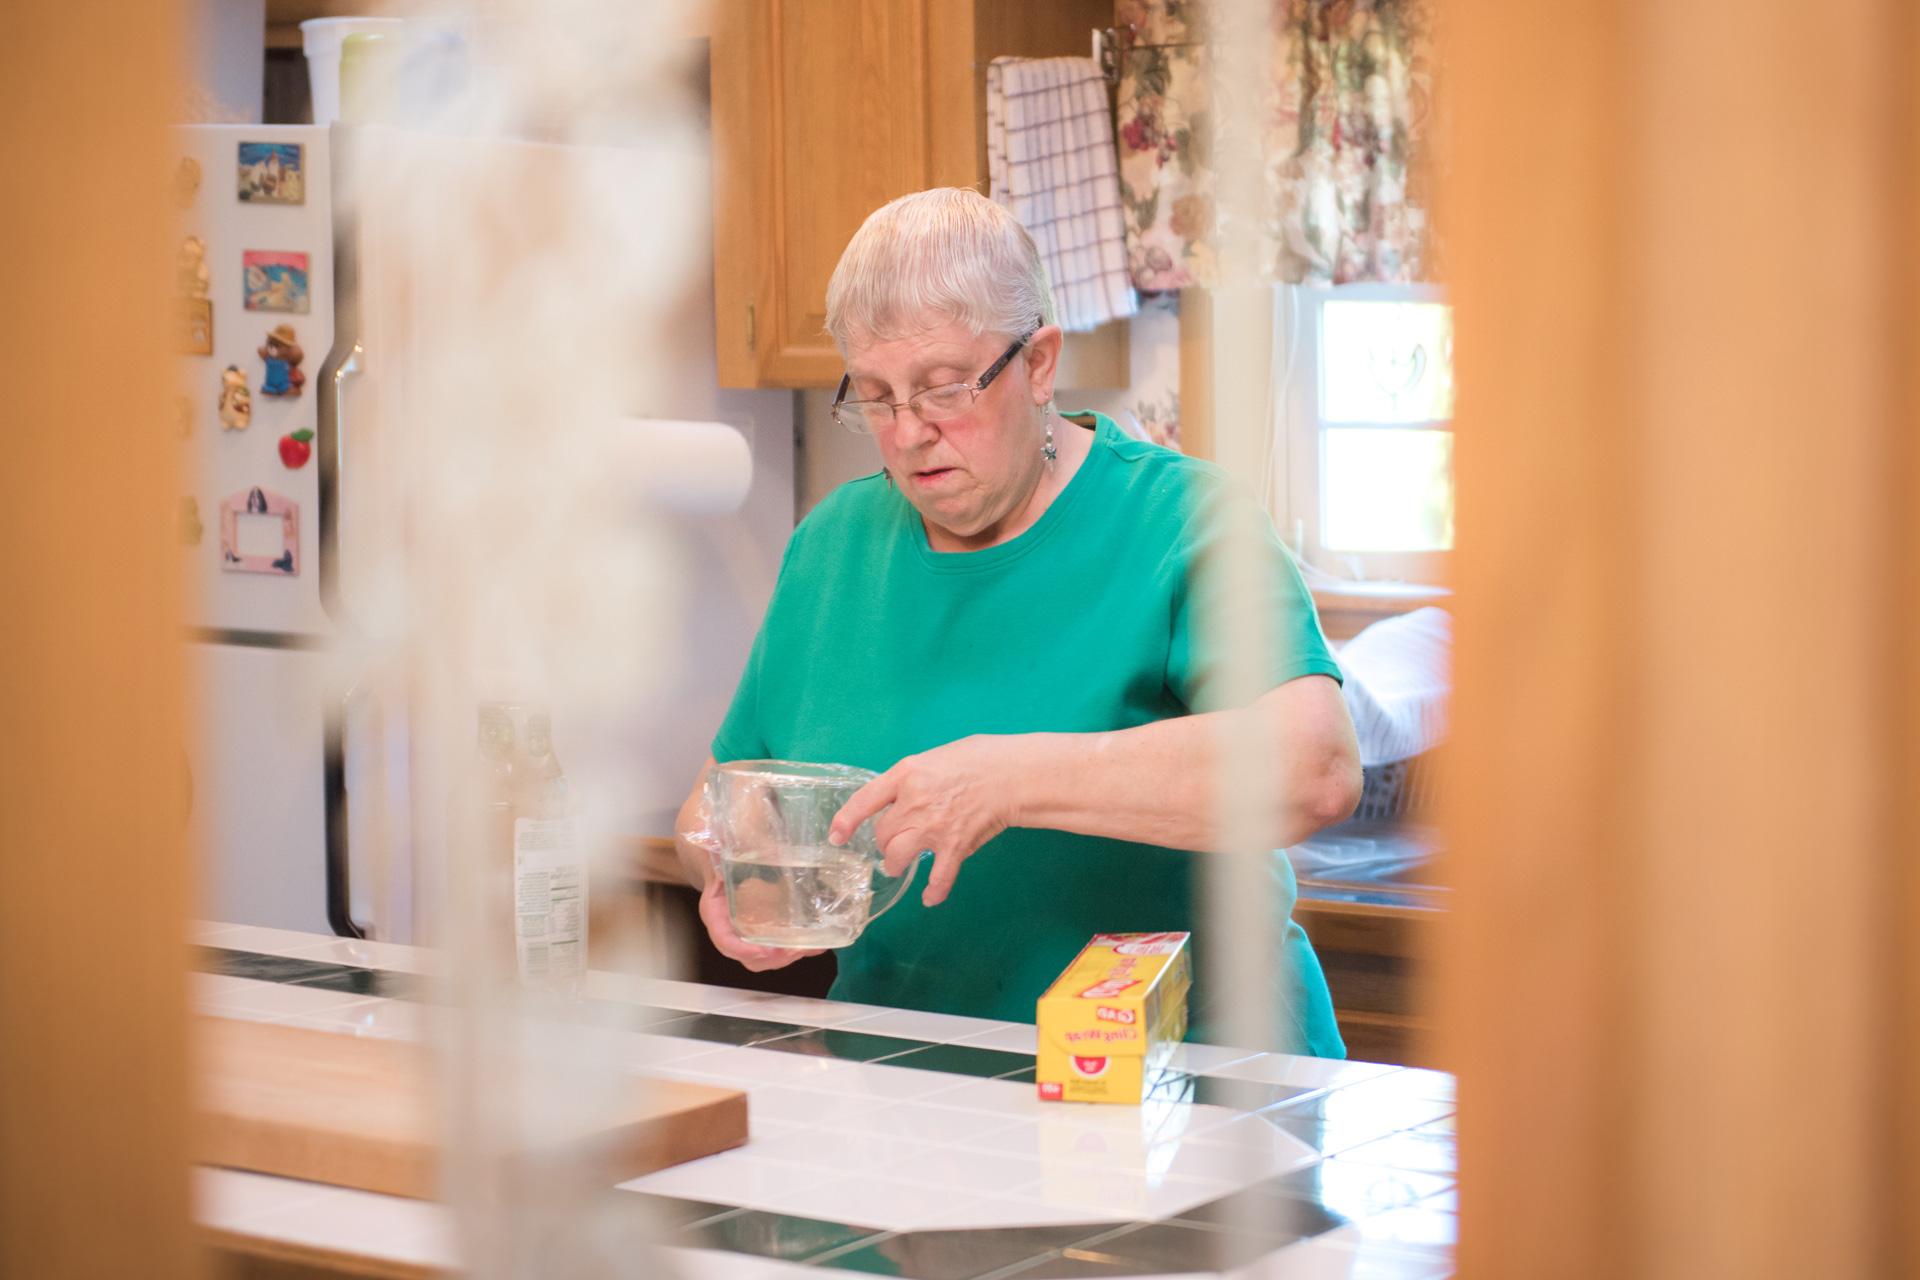 Woman at kitchen counter